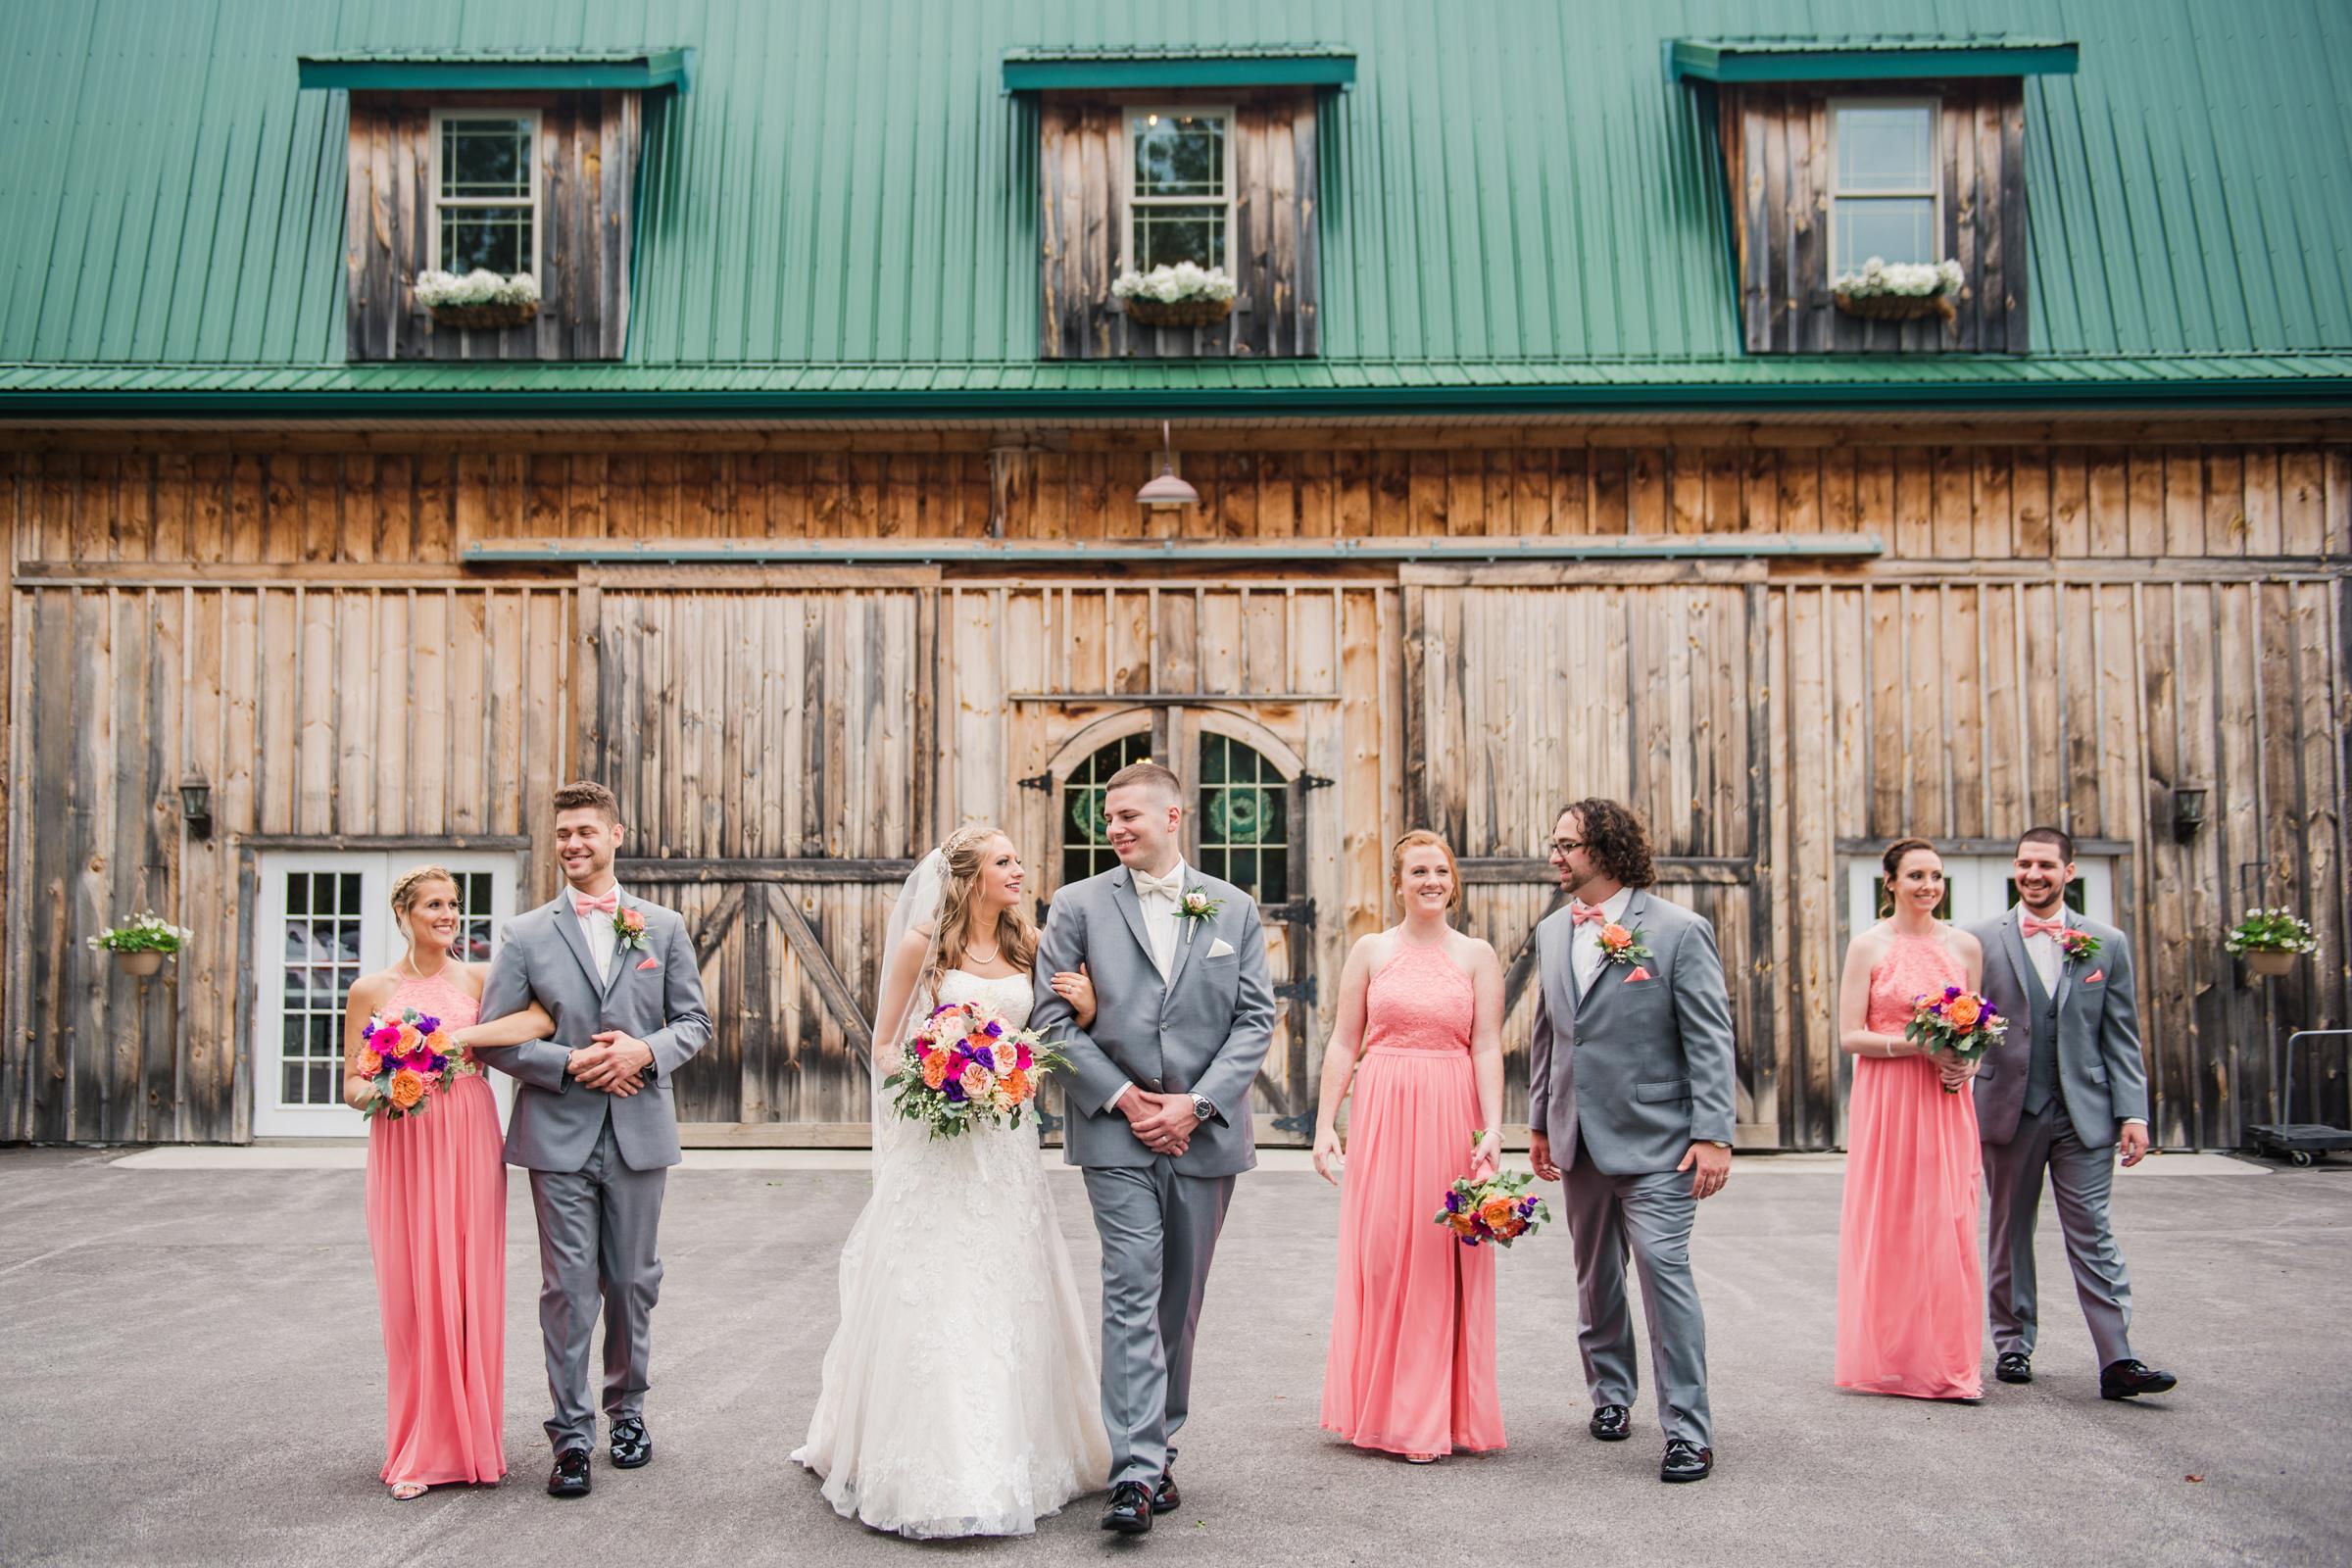 Wolf_Oak_Acres_Central_NY_Wedding_JILL_STUDIO_Rochester_NY_Photographer_DSC_8625.jpg